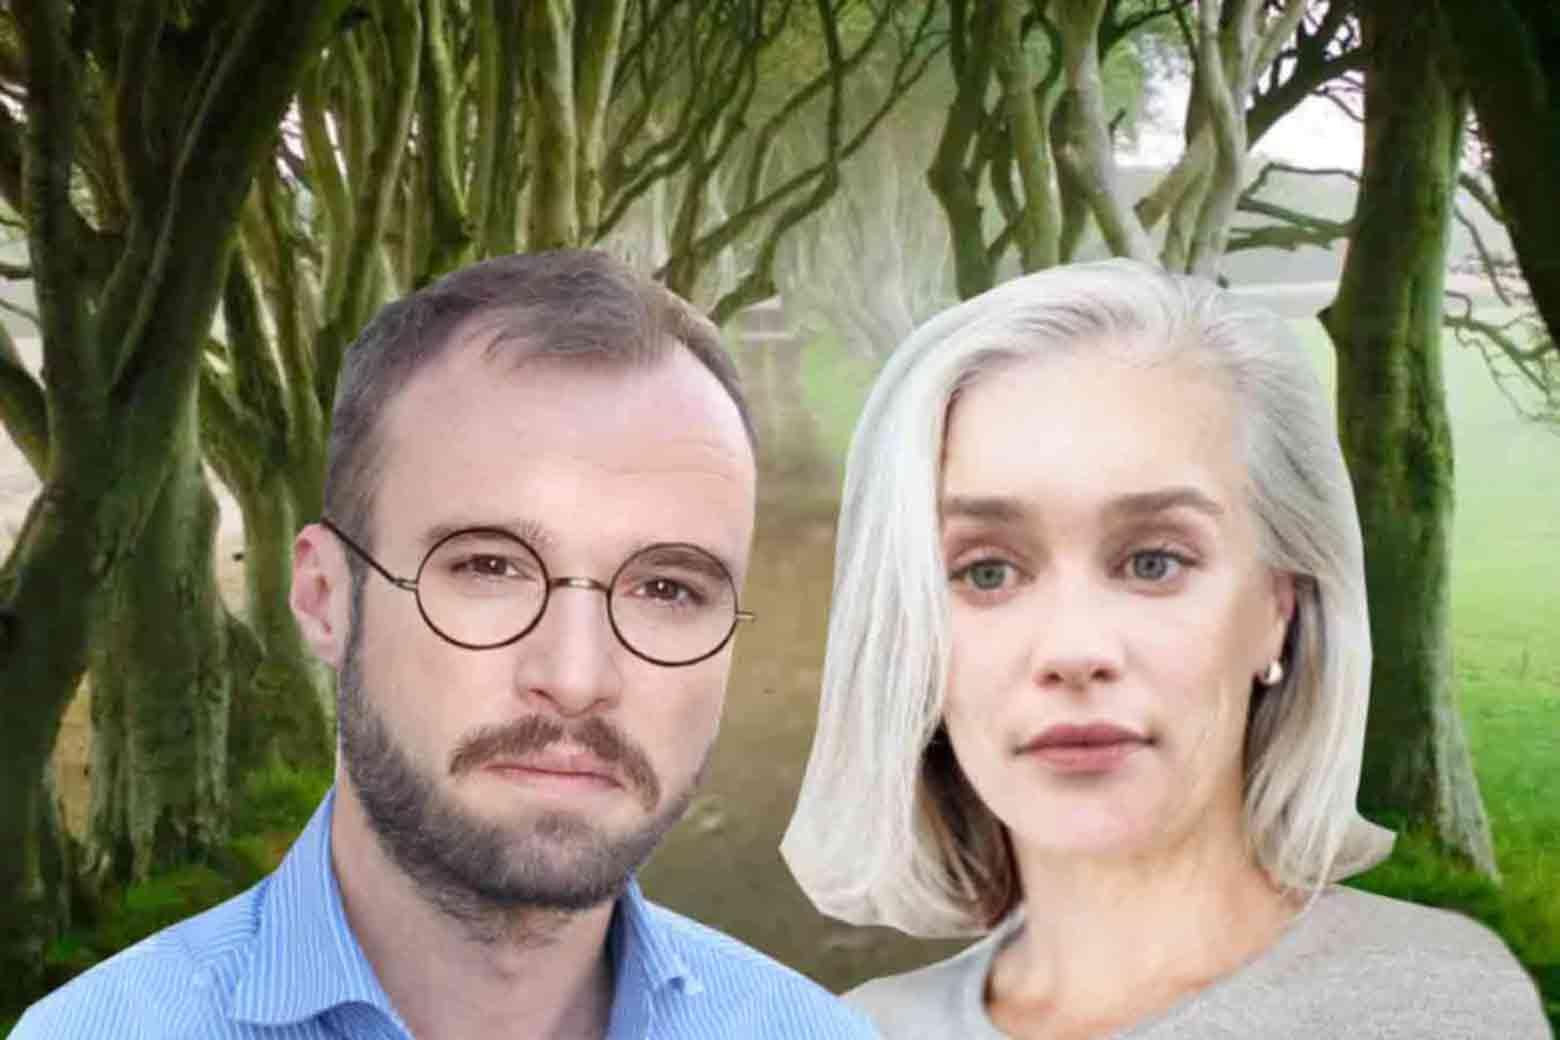 Photo illustration of Jon Snow and Daenerys Targaryen, Nineteen Years Later, maybe, probably.